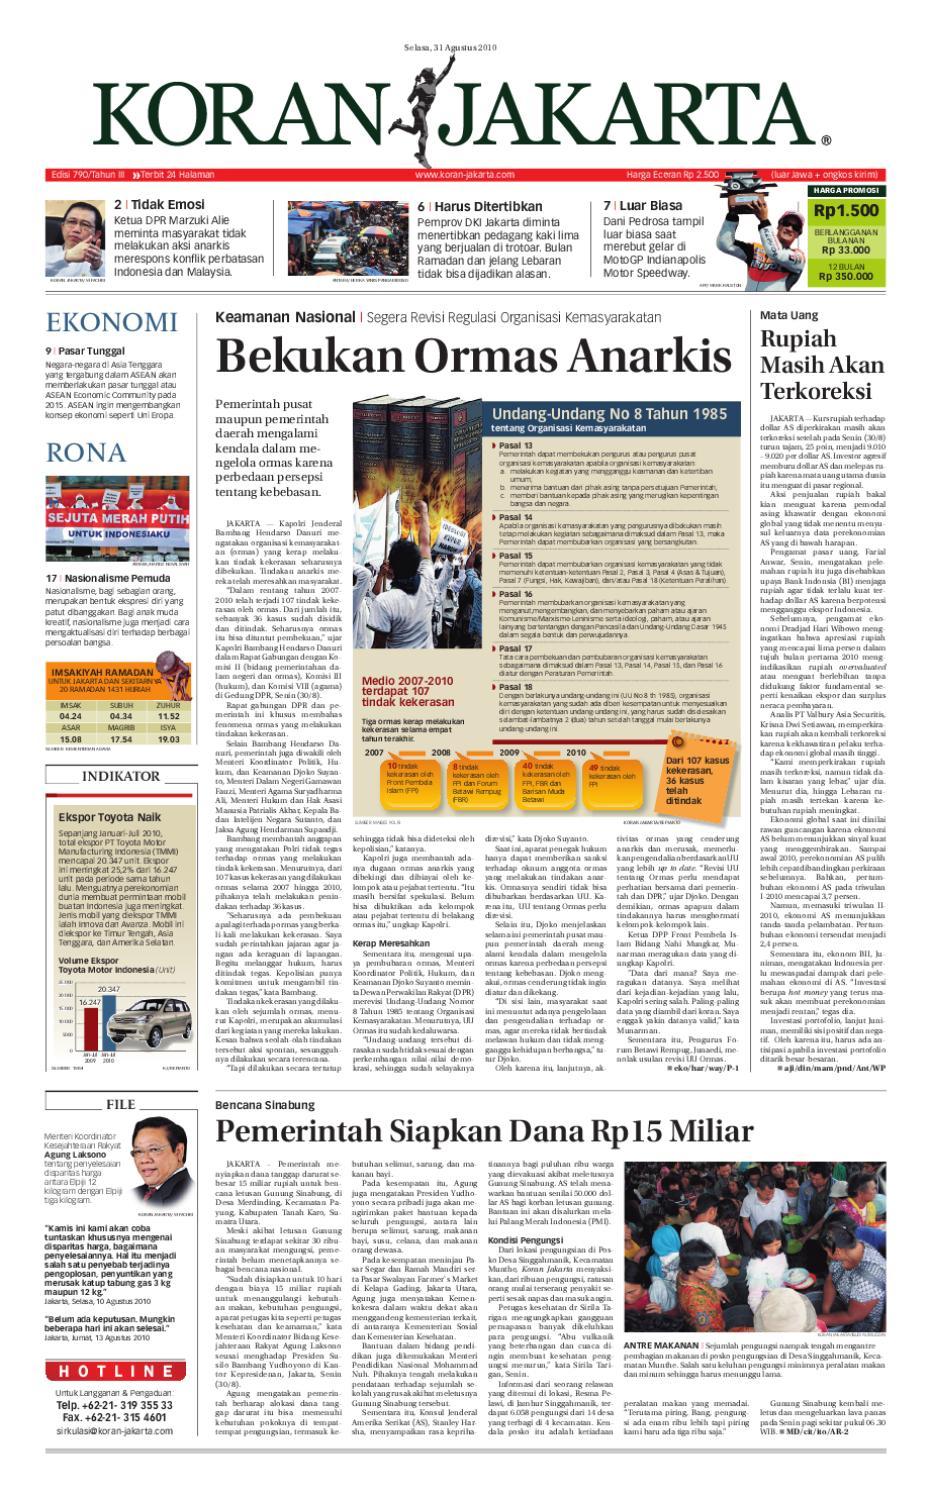 Edisi 790 31 Agustus 2010 By Pt Berita Nusantara Issuu Parcel Makanan Pja 1606